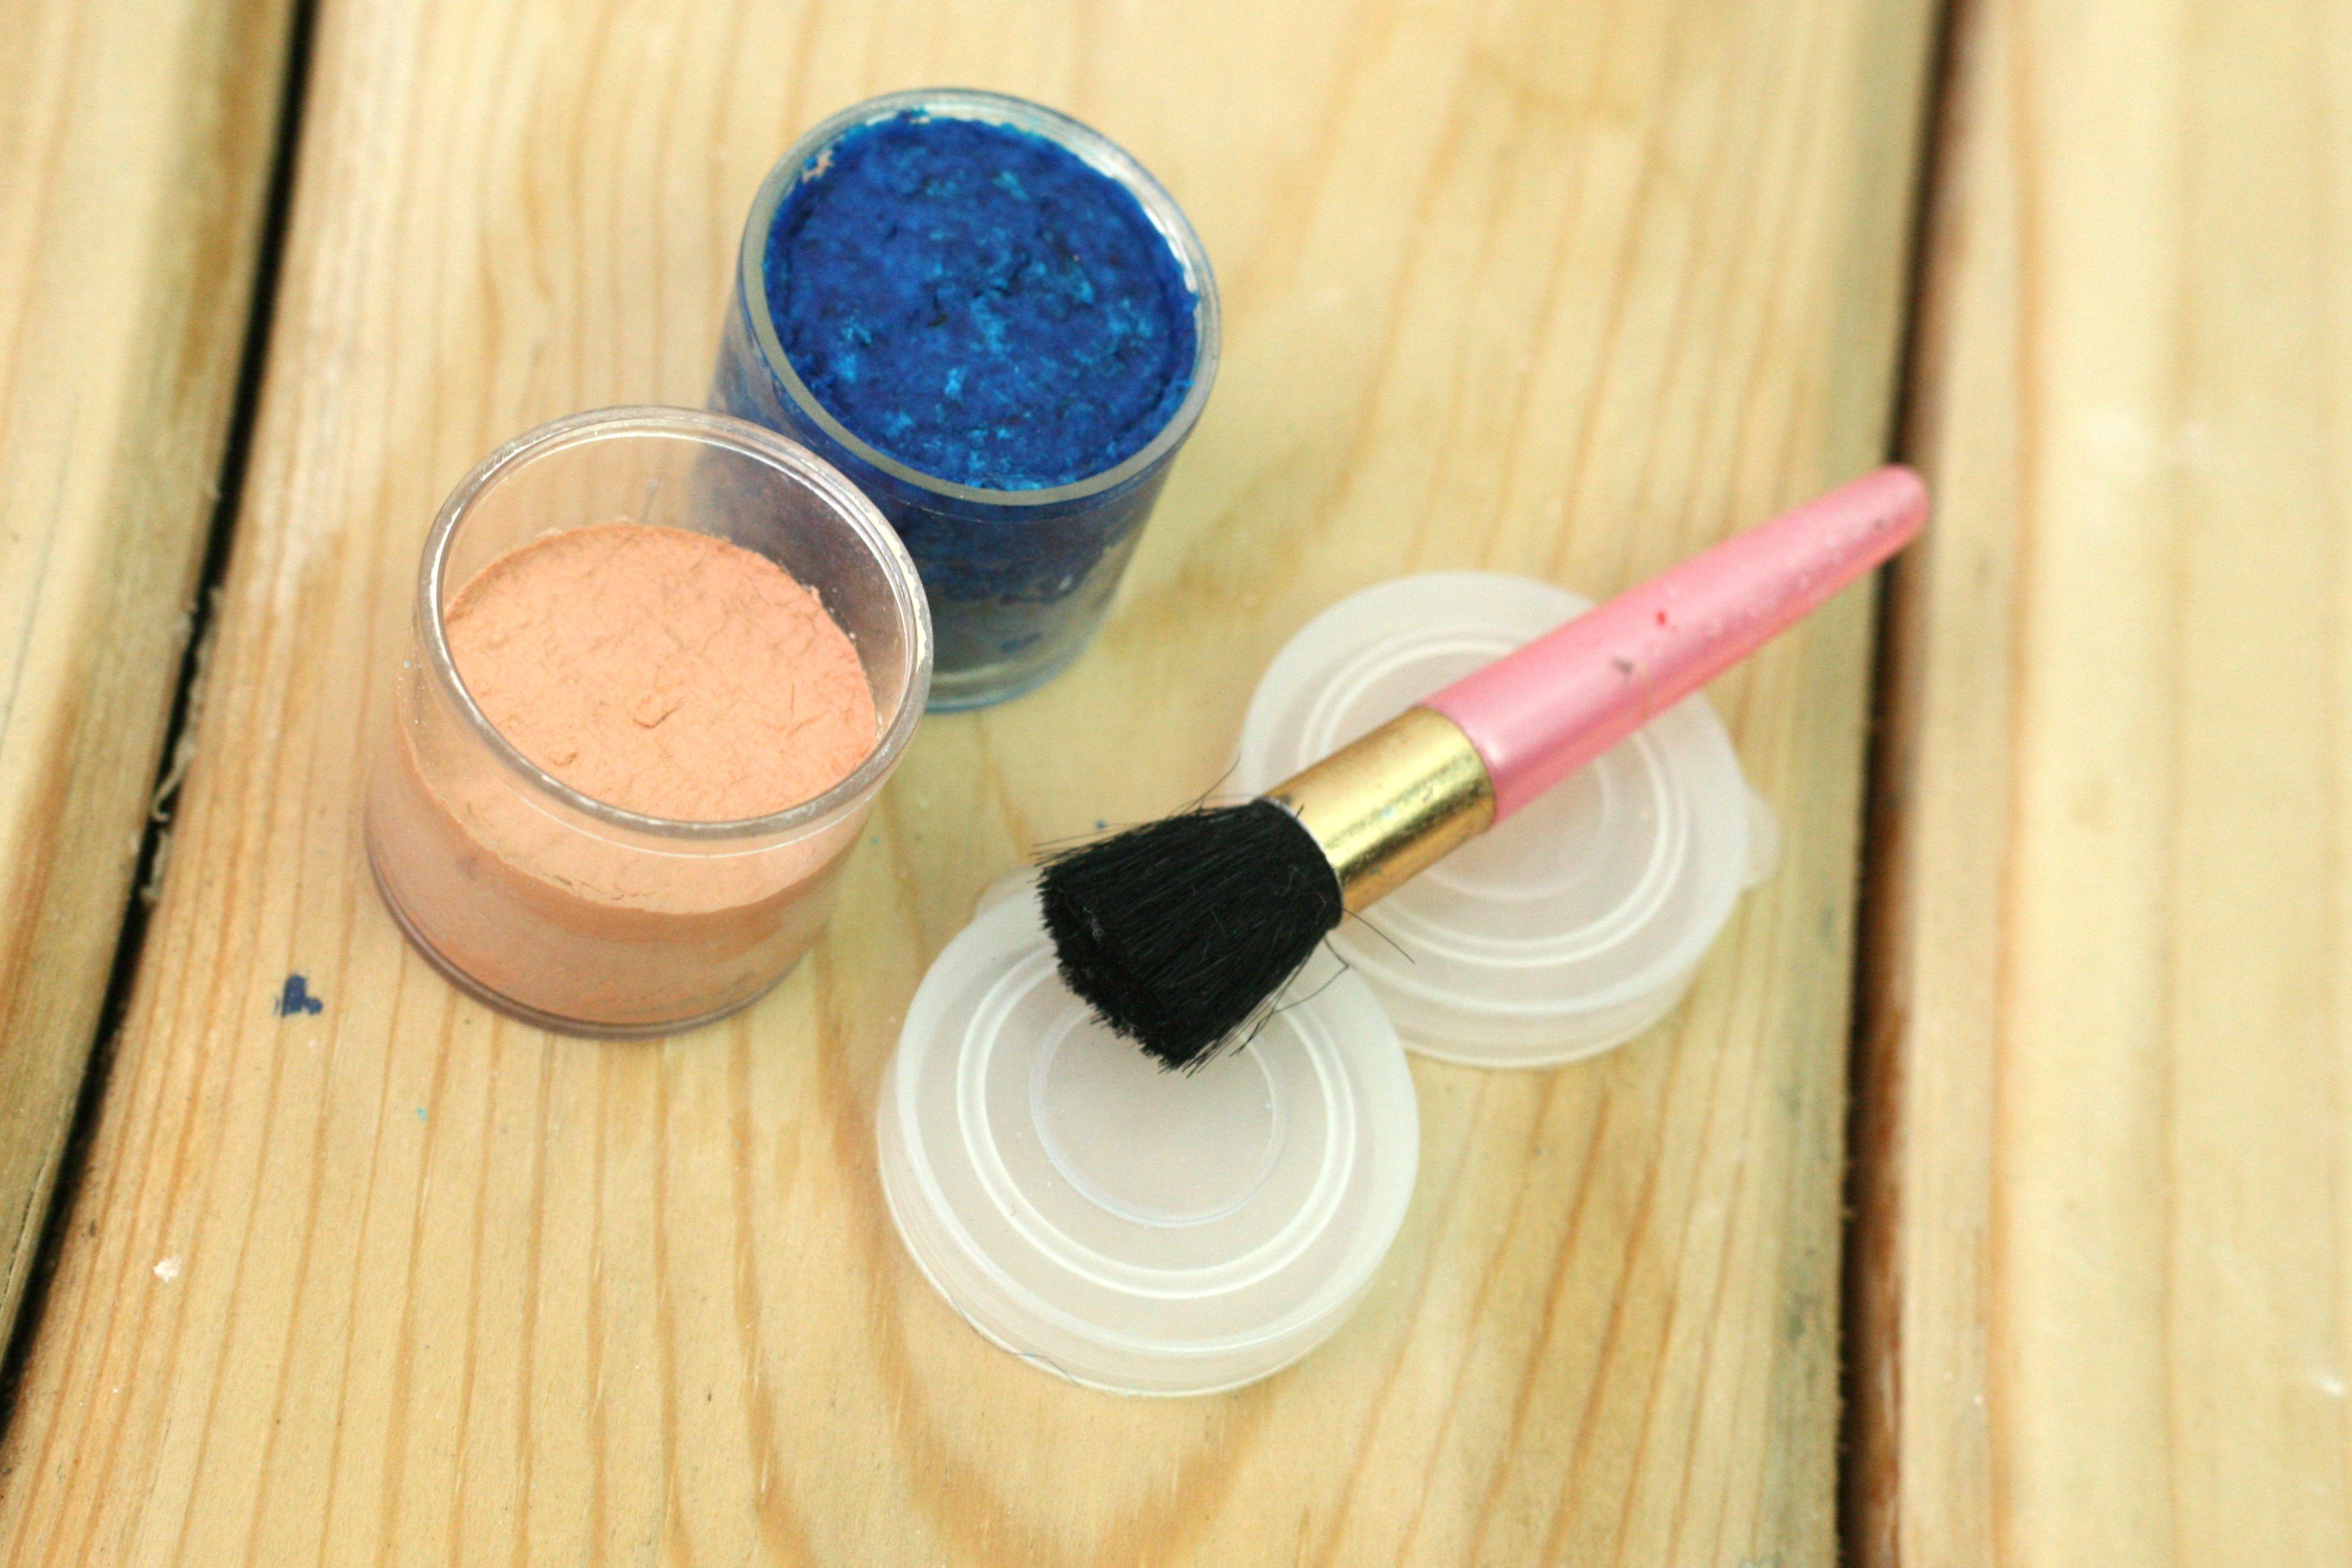 Make Eyeshadow at Home How to make eyeshadow, Diy